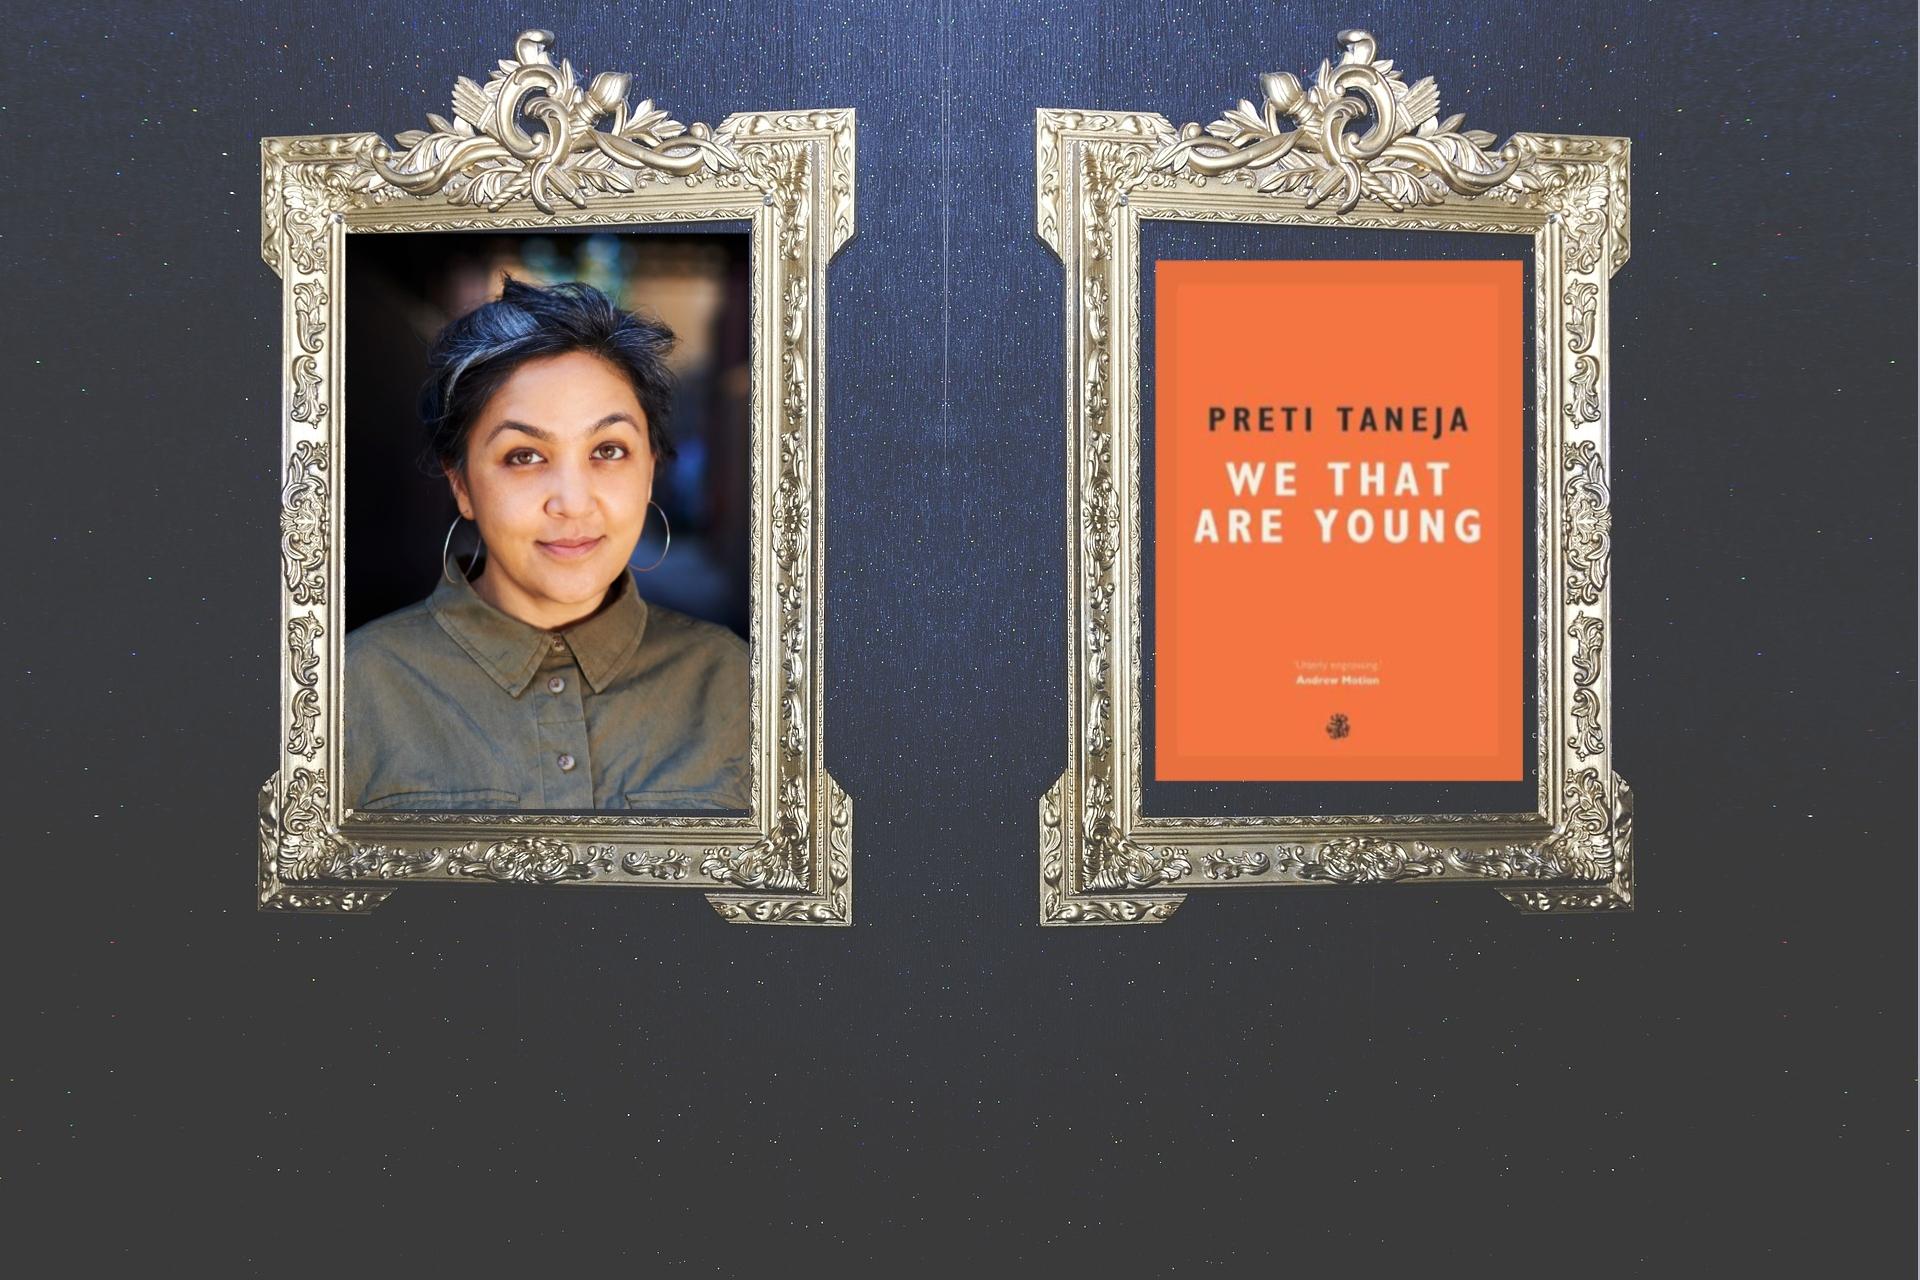 Industry Insight: Q&A with Preti Taneja